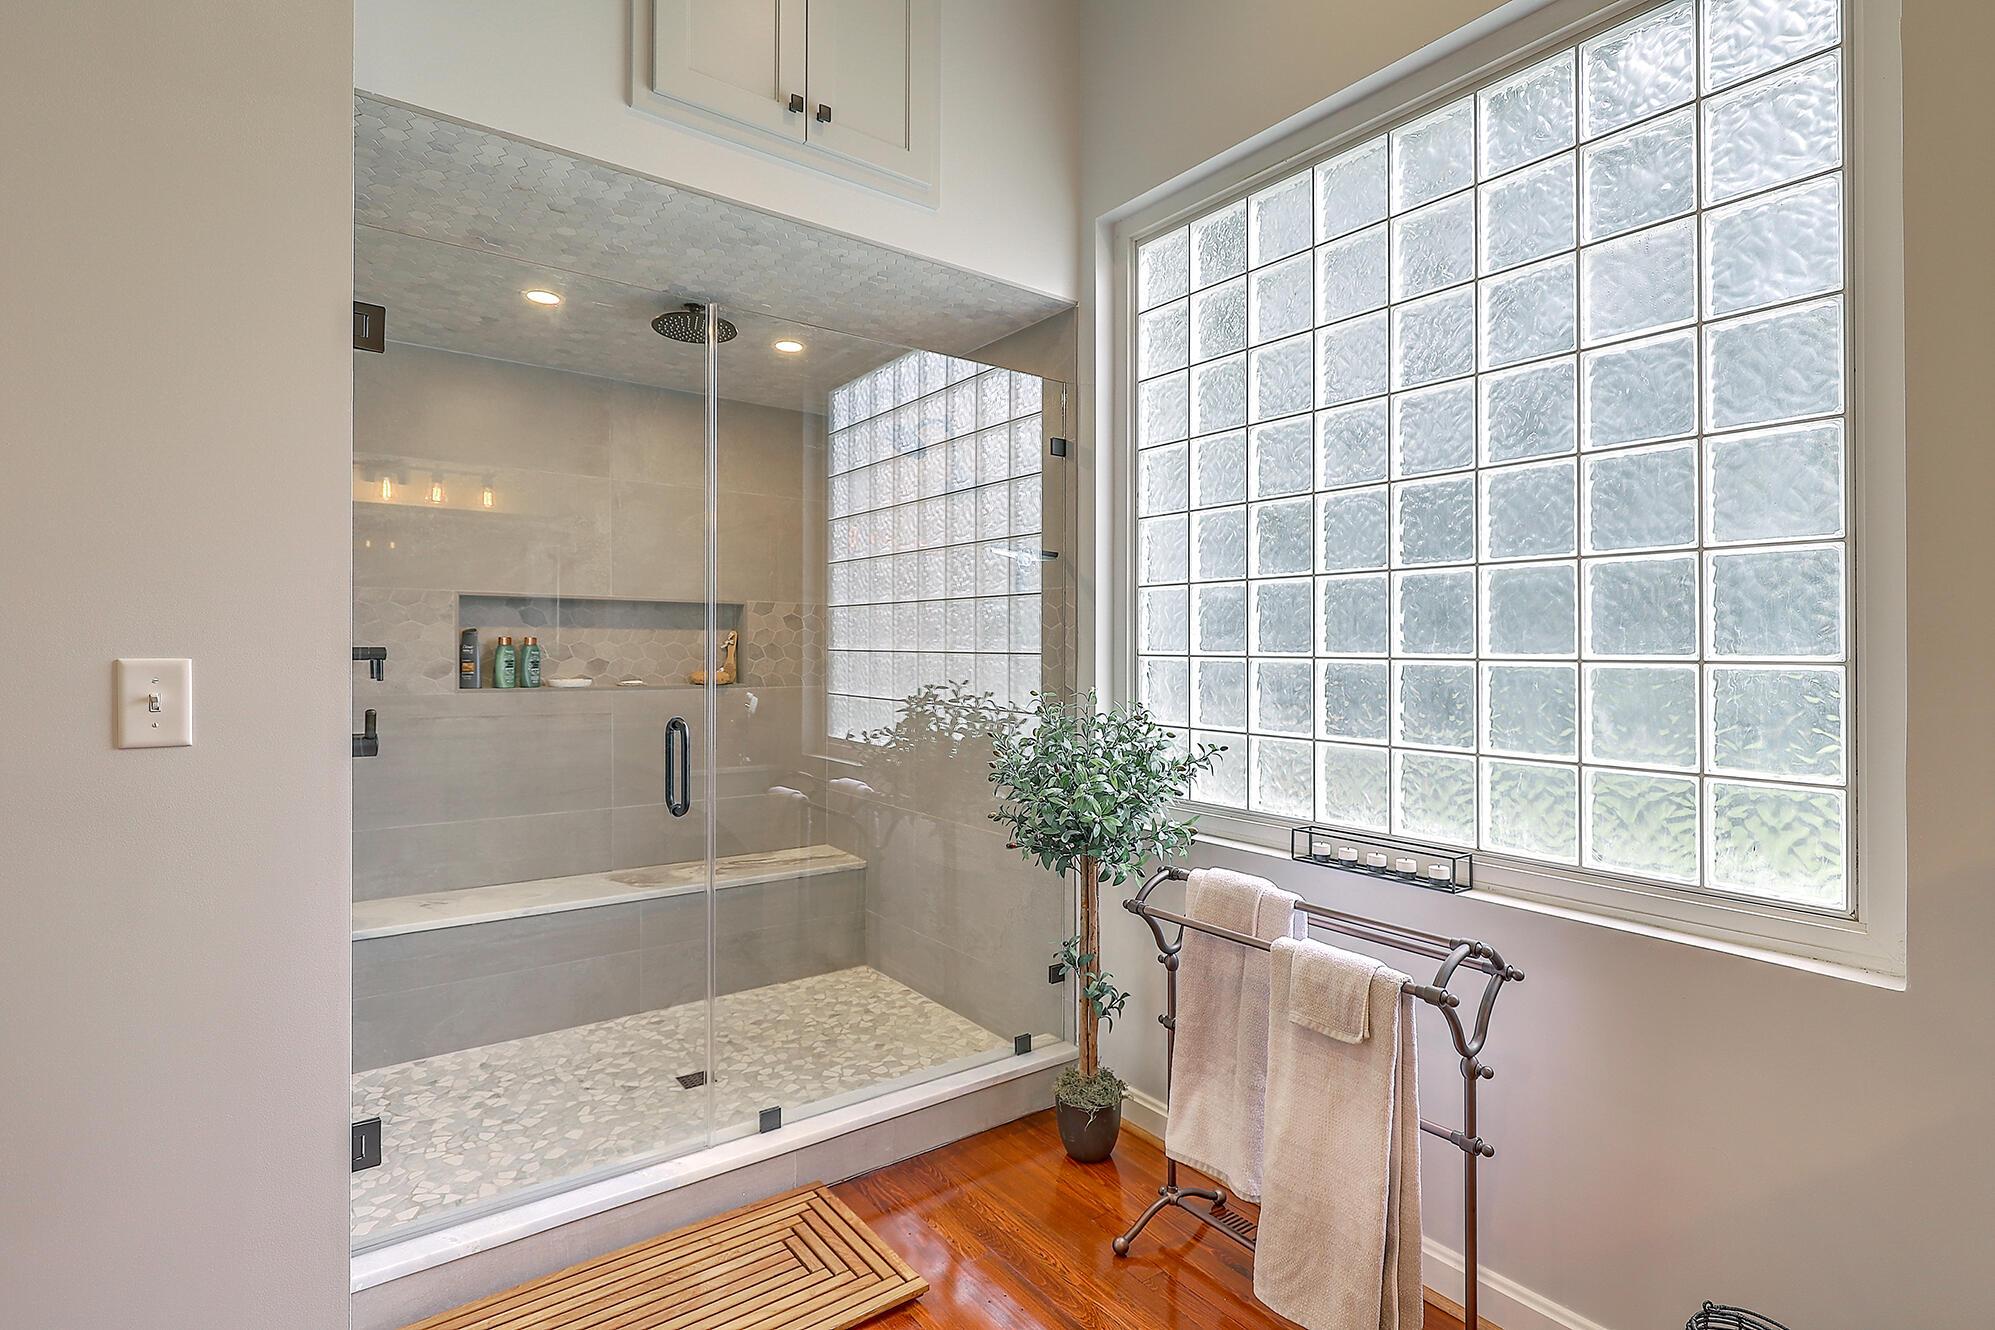 Summerville Homes For Sale - 102 Hickory, Summerville, SC - 99